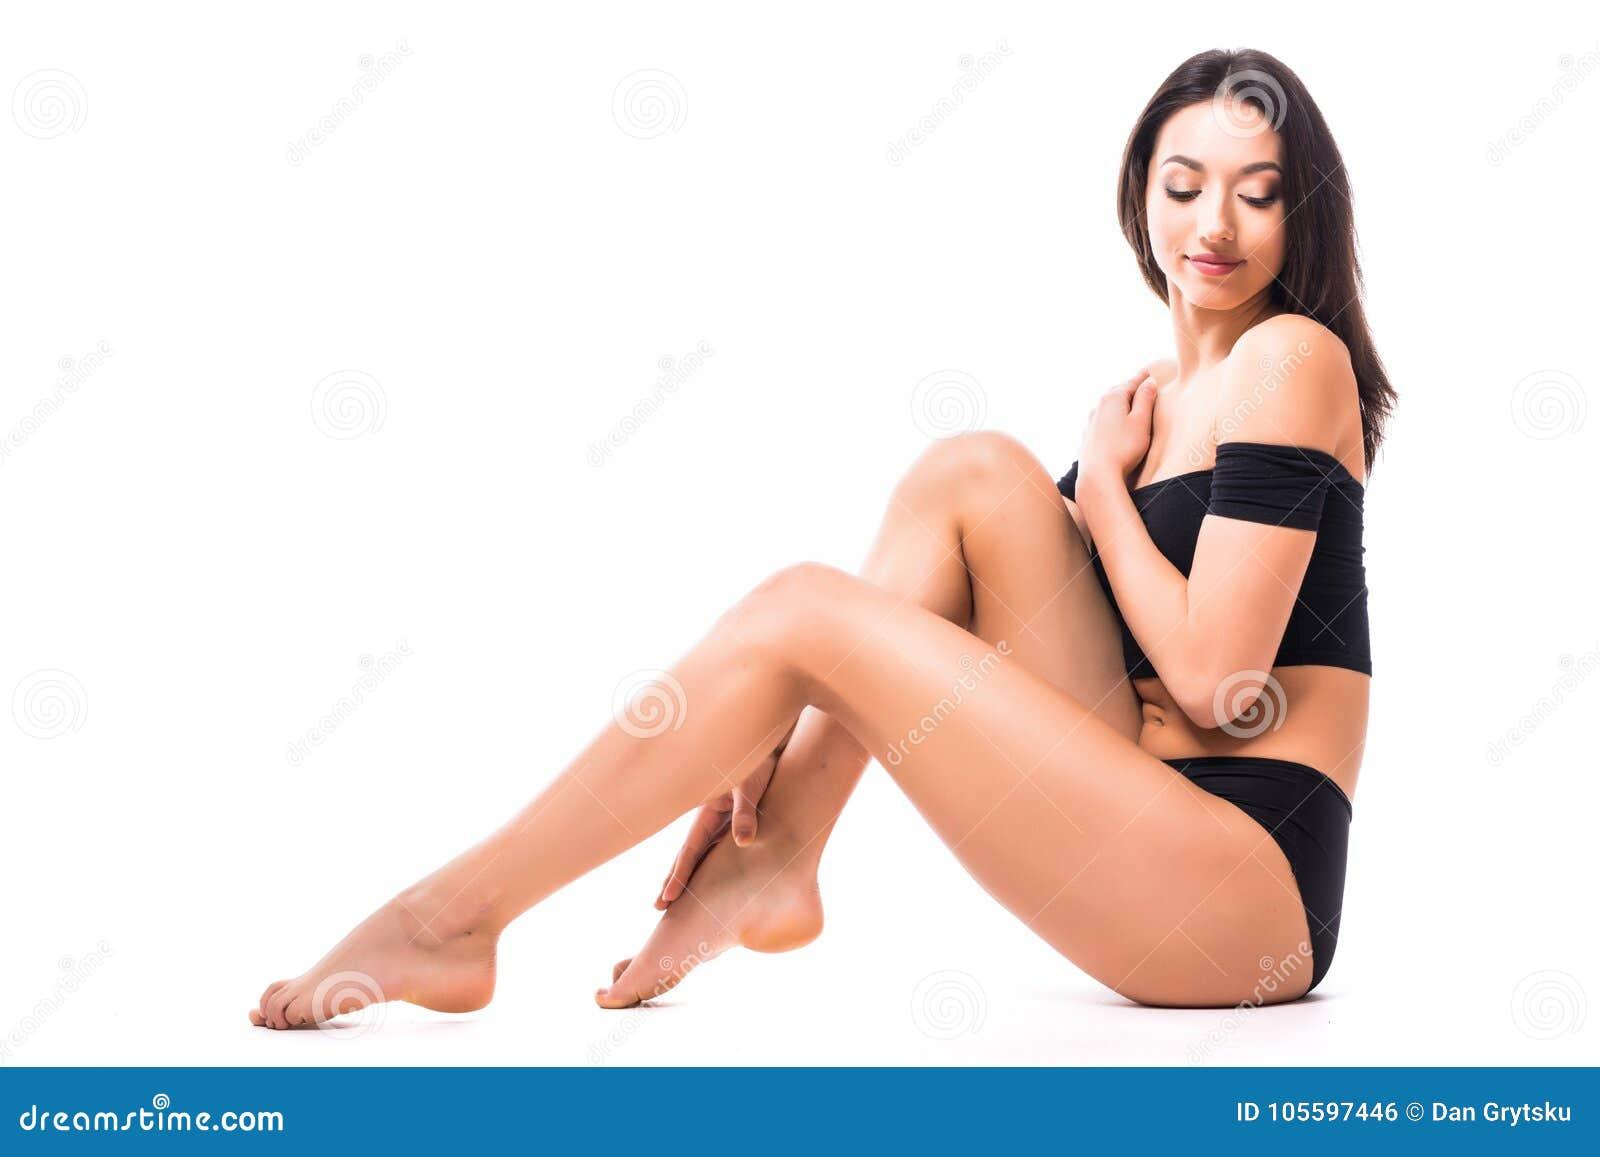 946a92a3efeb4 Beautiful Slim Body Woman In Good Shape Sport Slim On Floor Posing ...